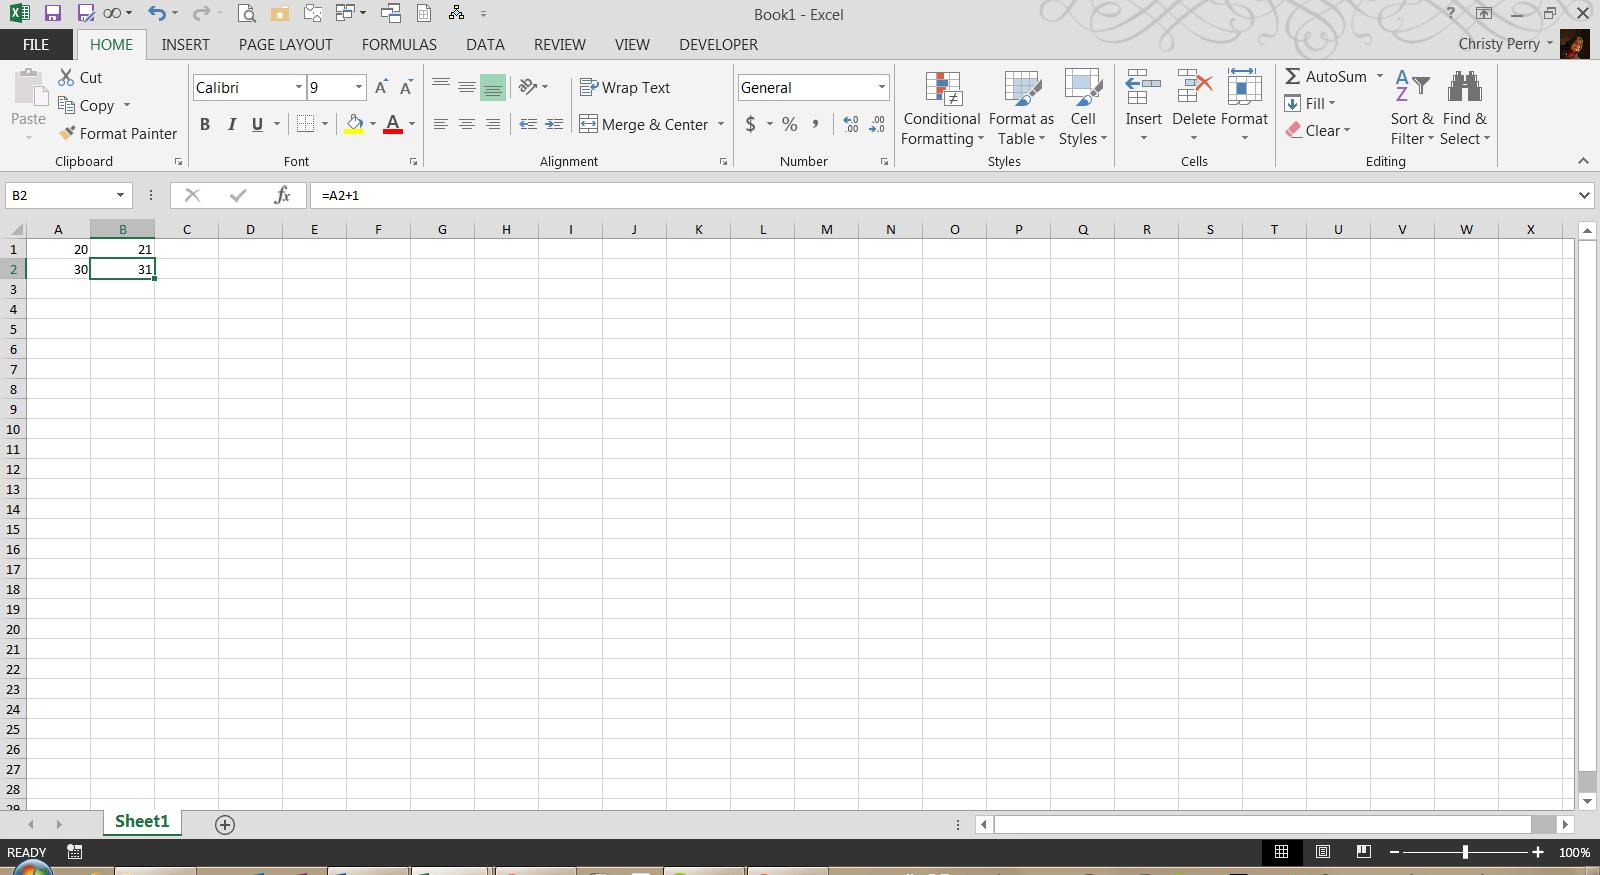 Excel Formula References Why Copying Formulas Sometimes